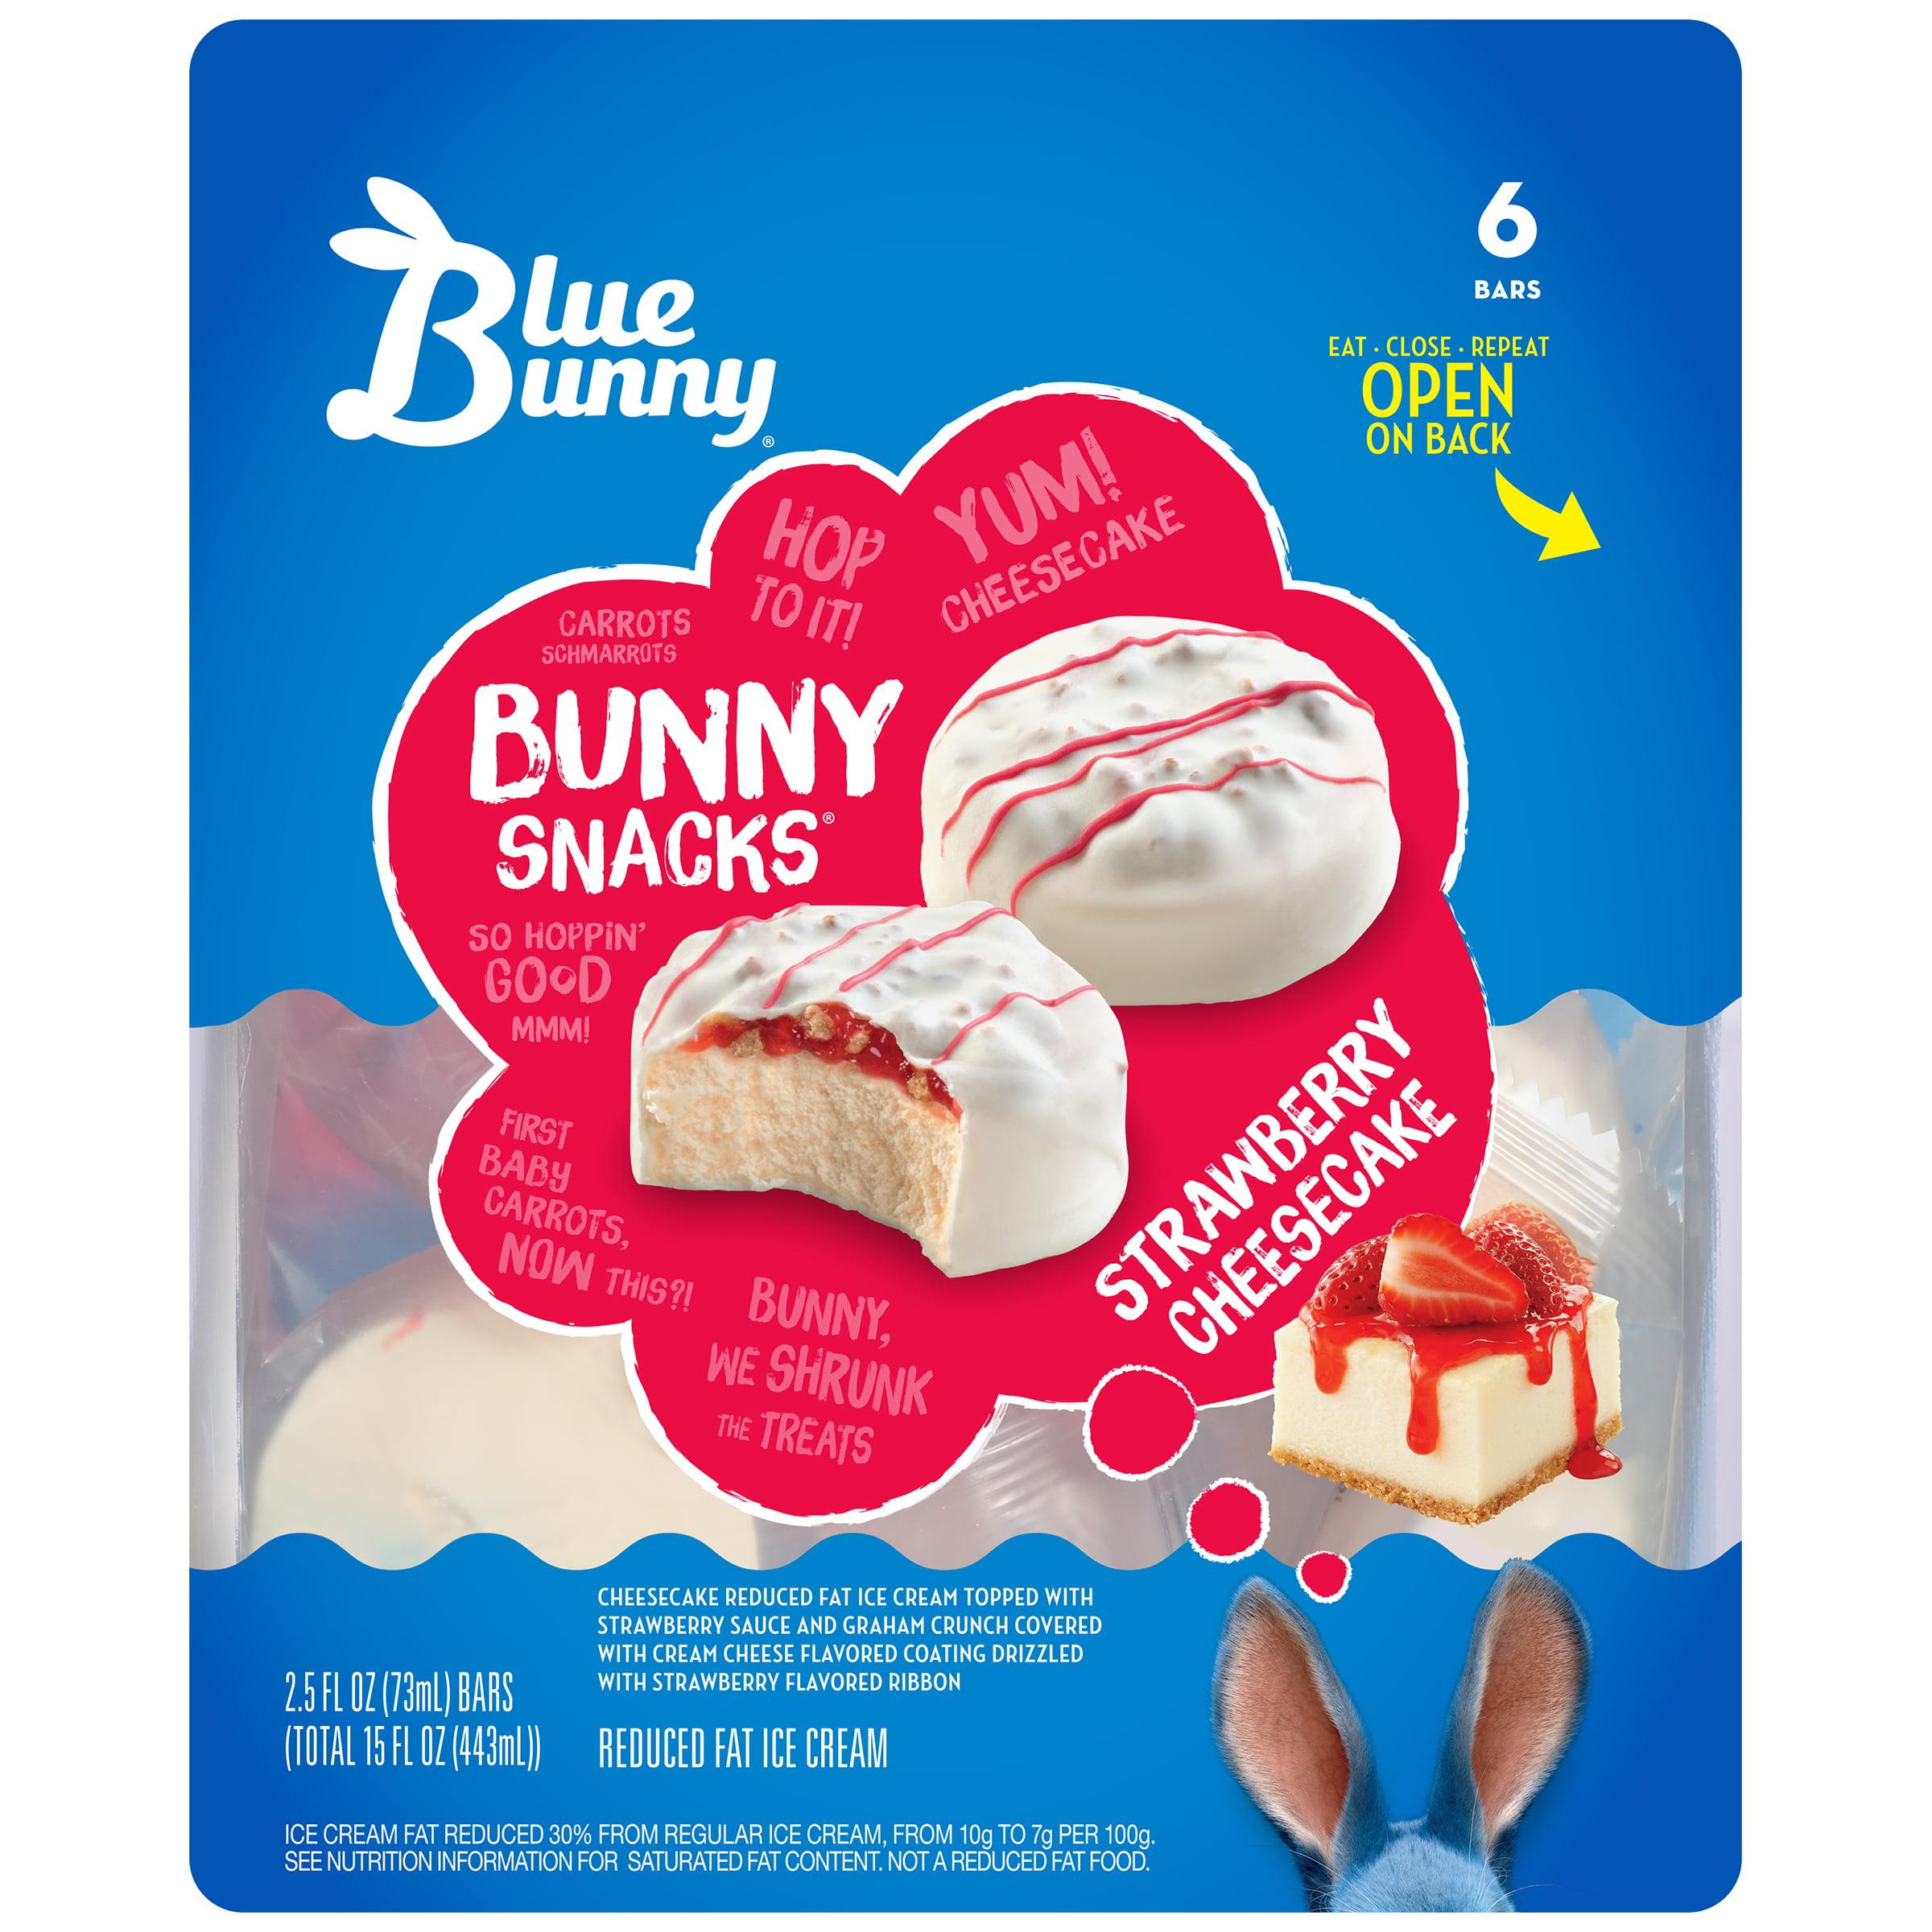 Admirable Blue Bunny Bunny Snacks Strawberry Cheesecake 6Pk Walmart Com Funny Birthday Cards Online Hendilapandamsfinfo